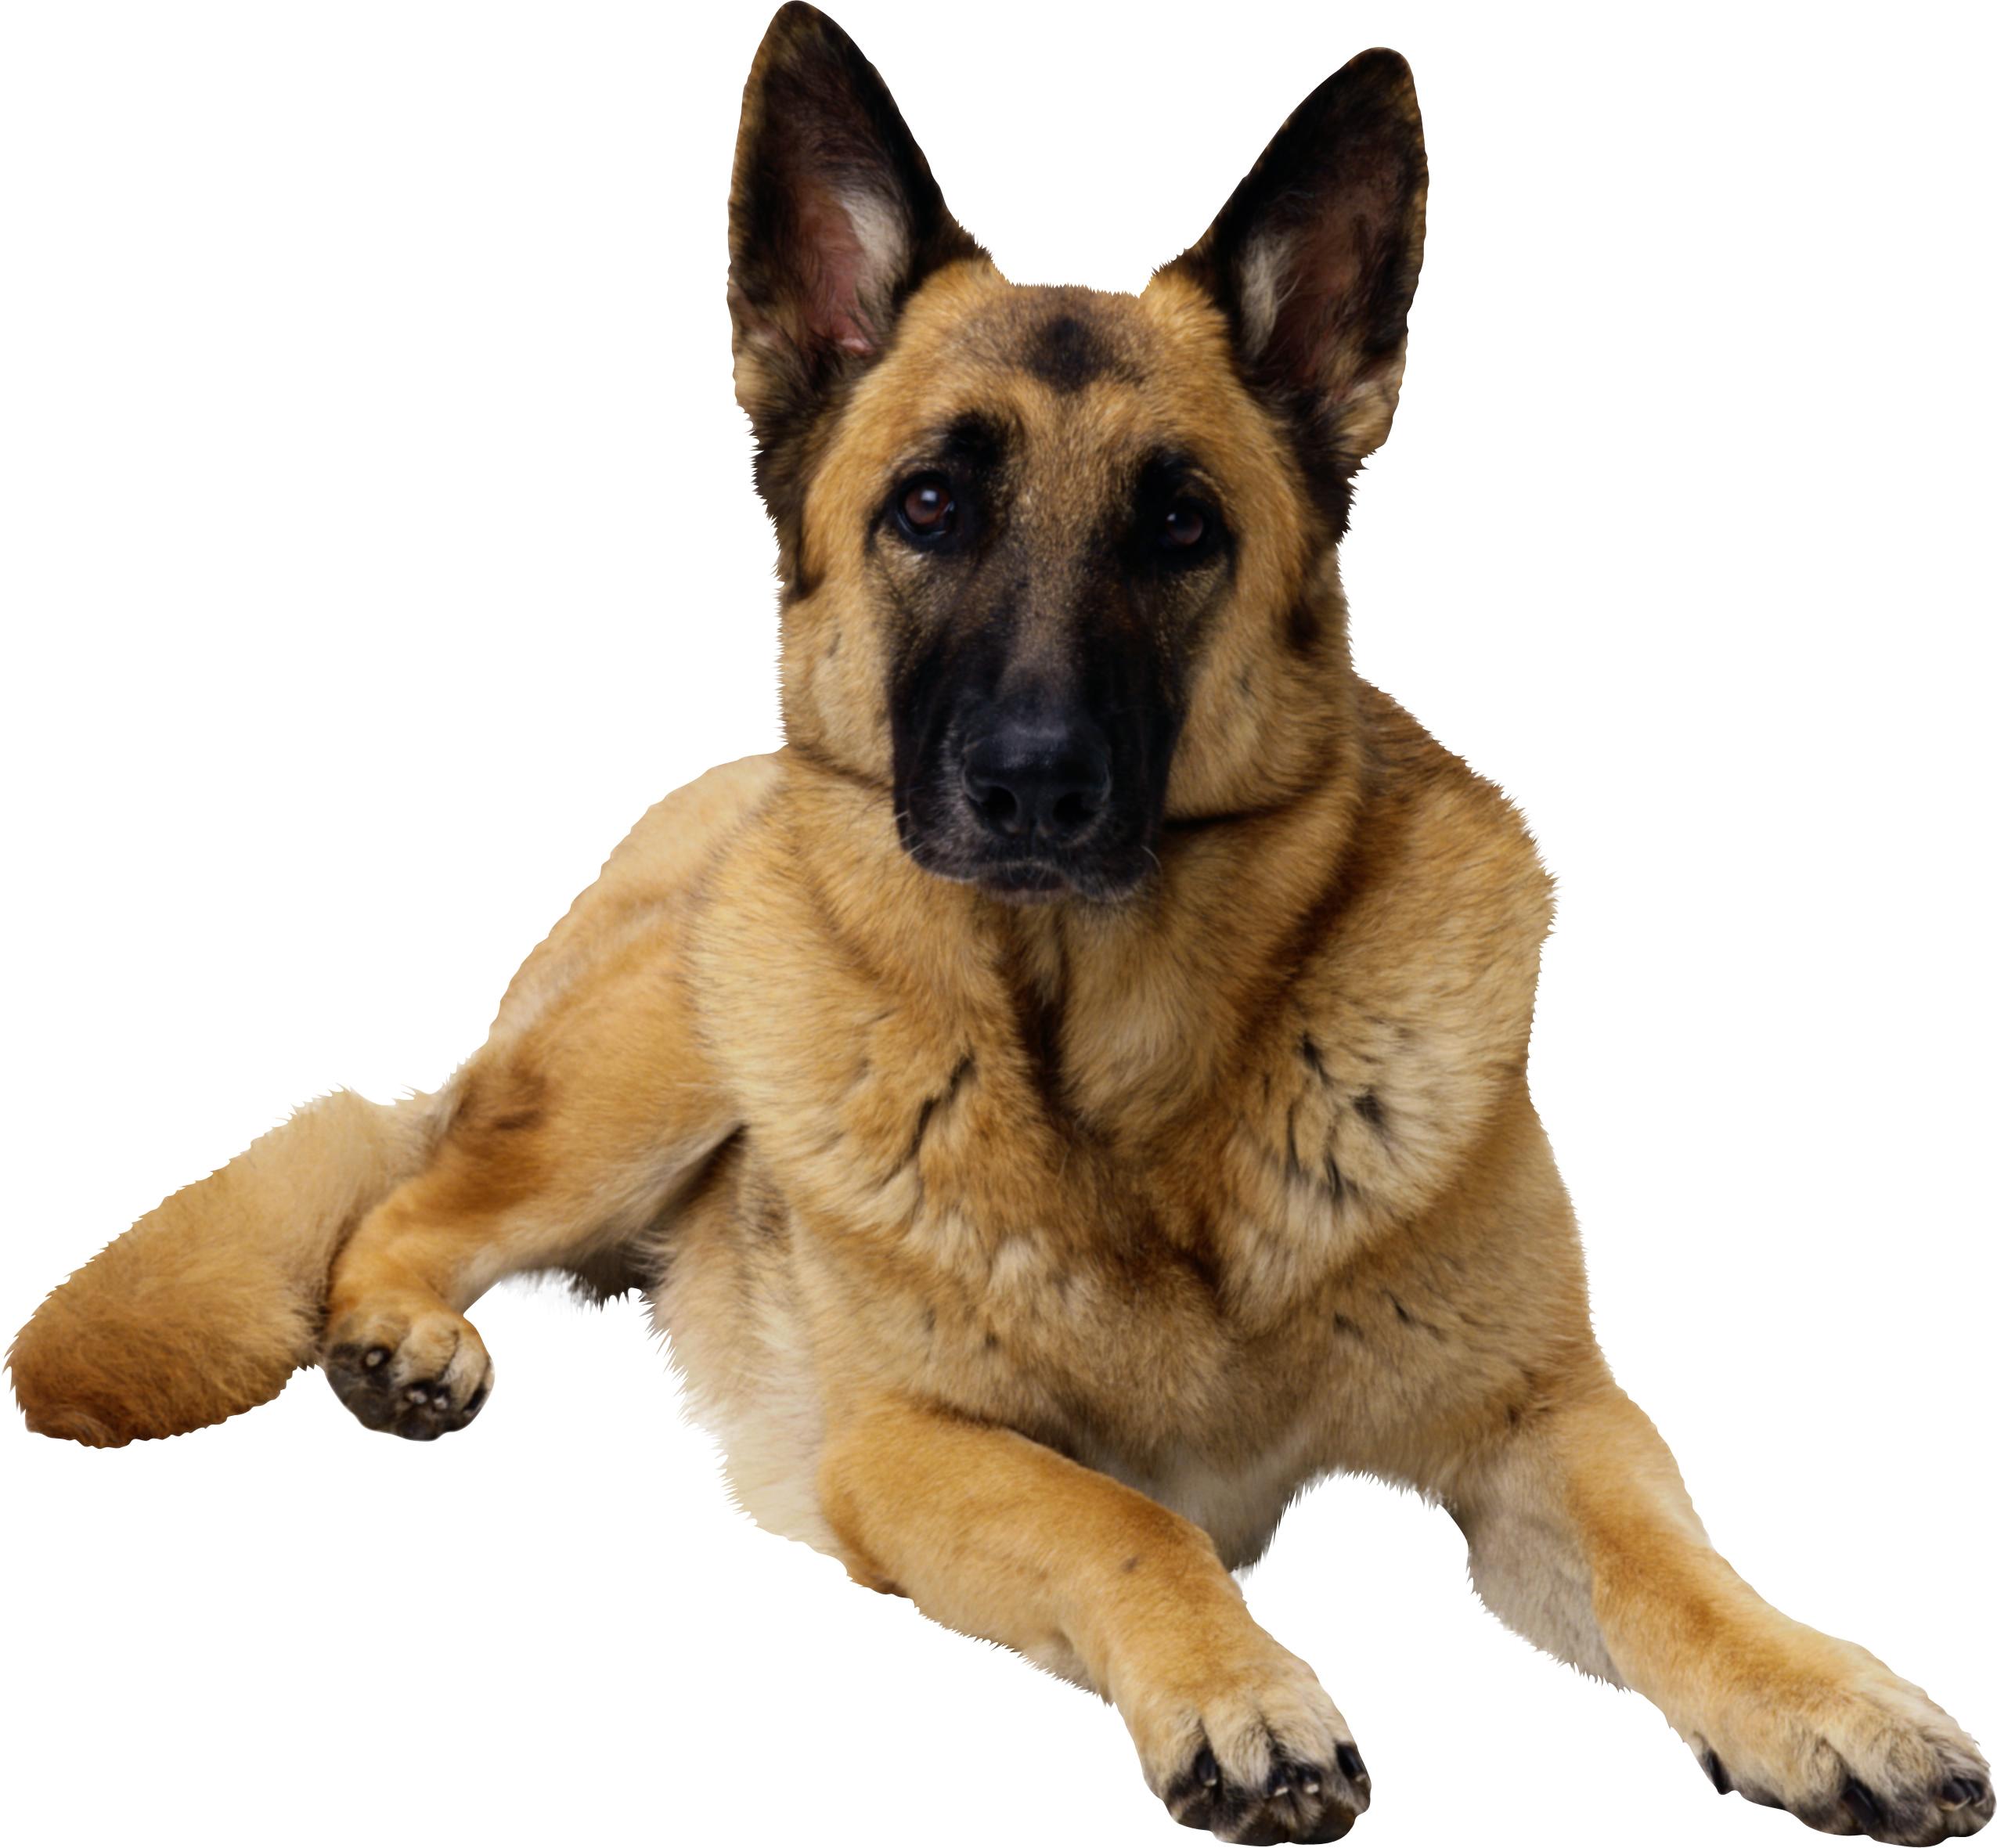 собака, фото, обои, овчарка, для рабочего стола